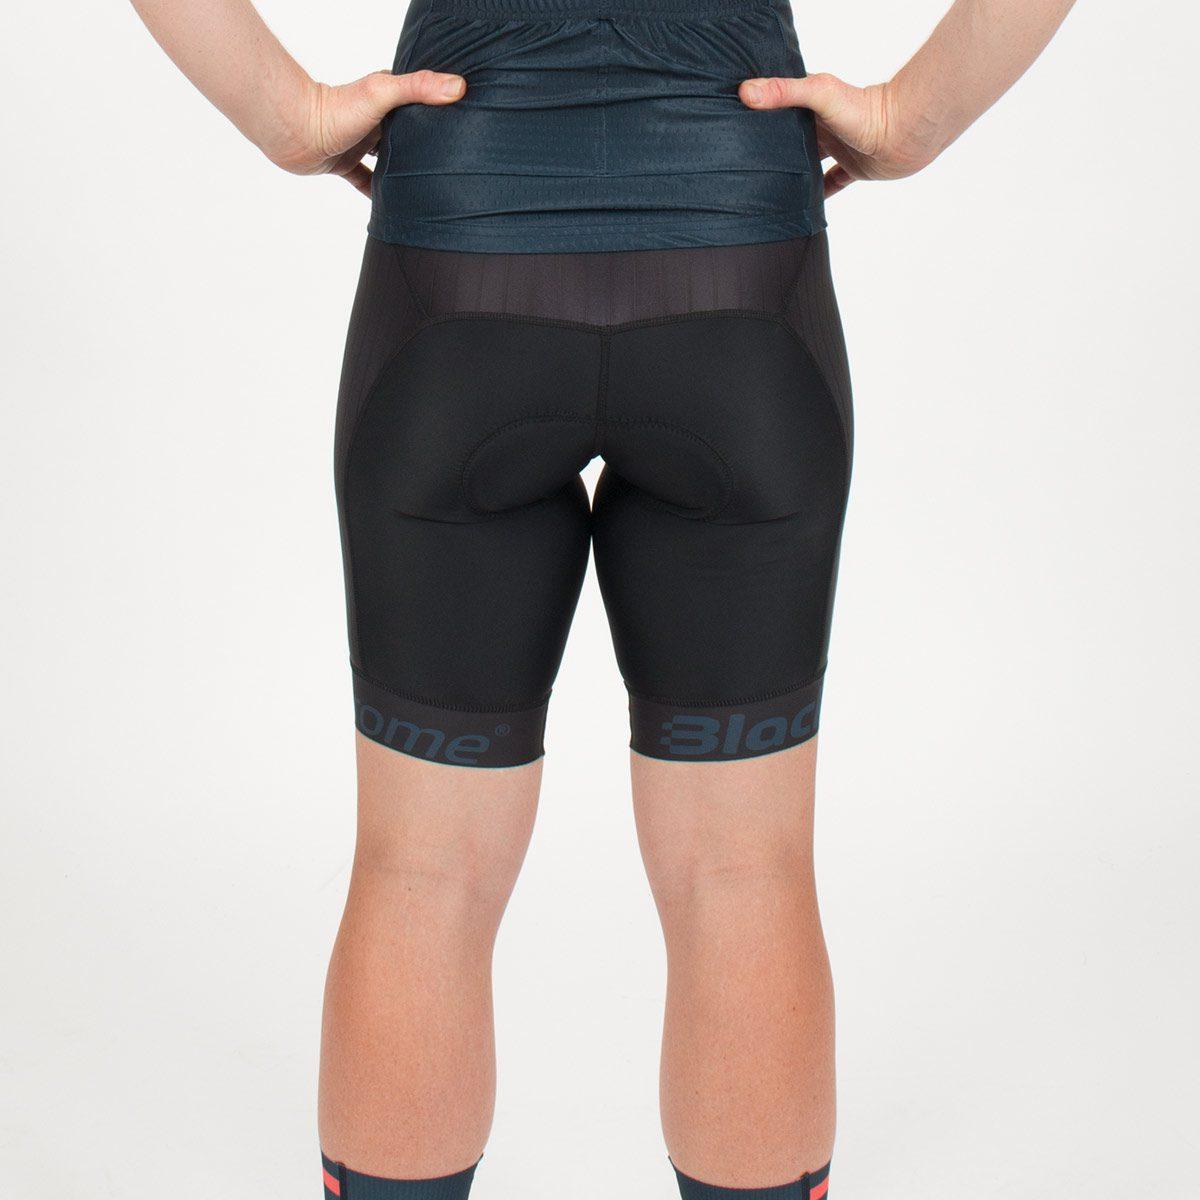 ... Front · Womens Rails v2.0 Performance Fit - Cycling Bibs - VL66968 -  Back ... 2bf343610